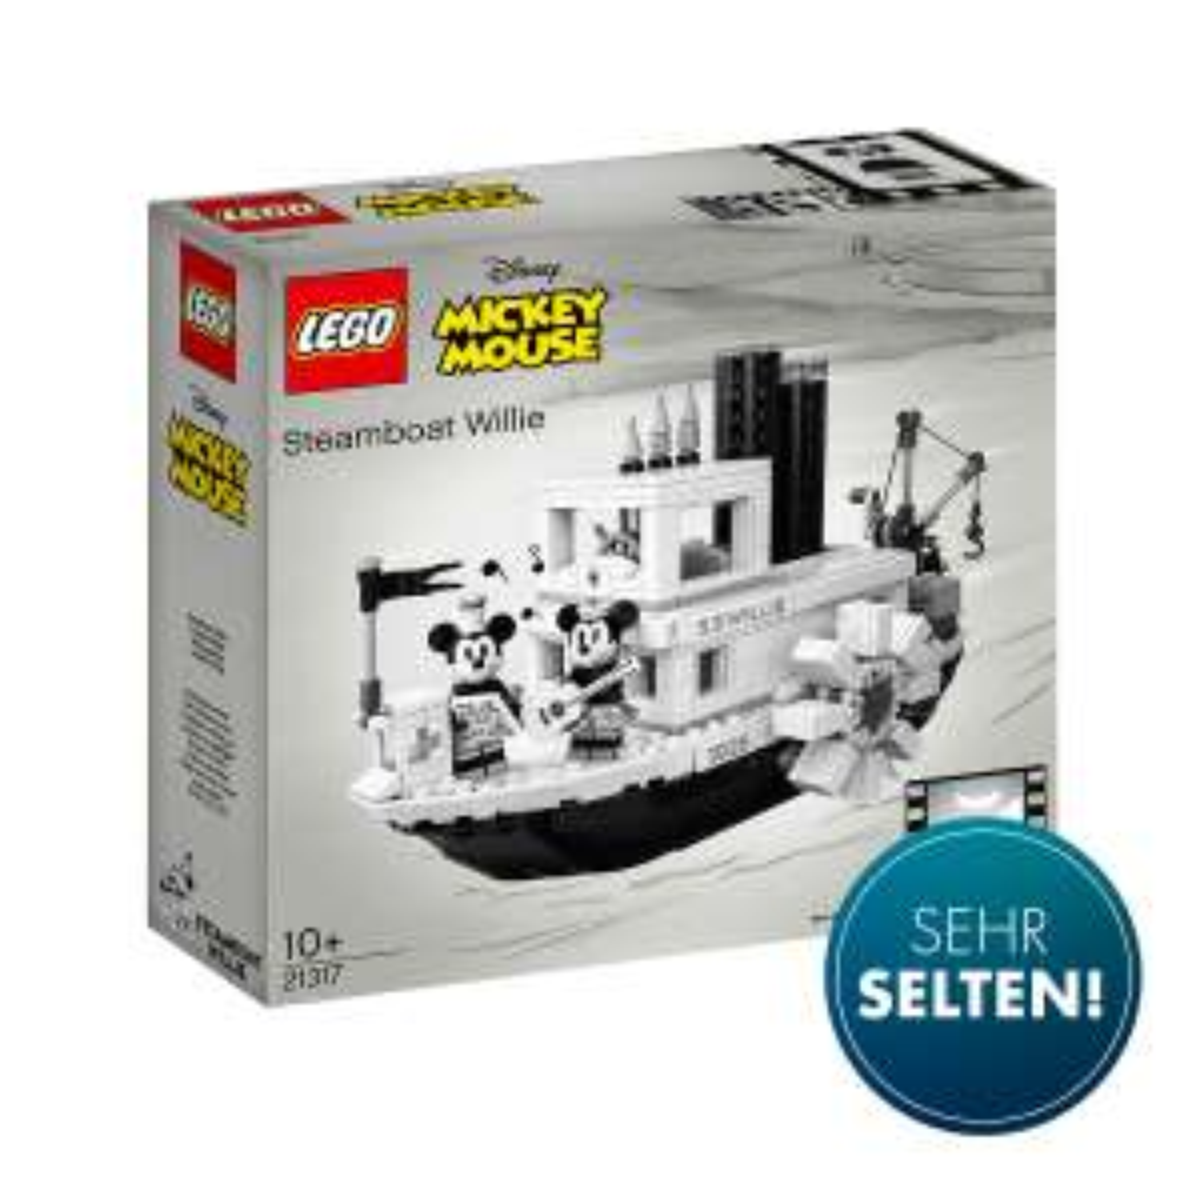 Lego 21317 Steamboat Willie bei Galeria